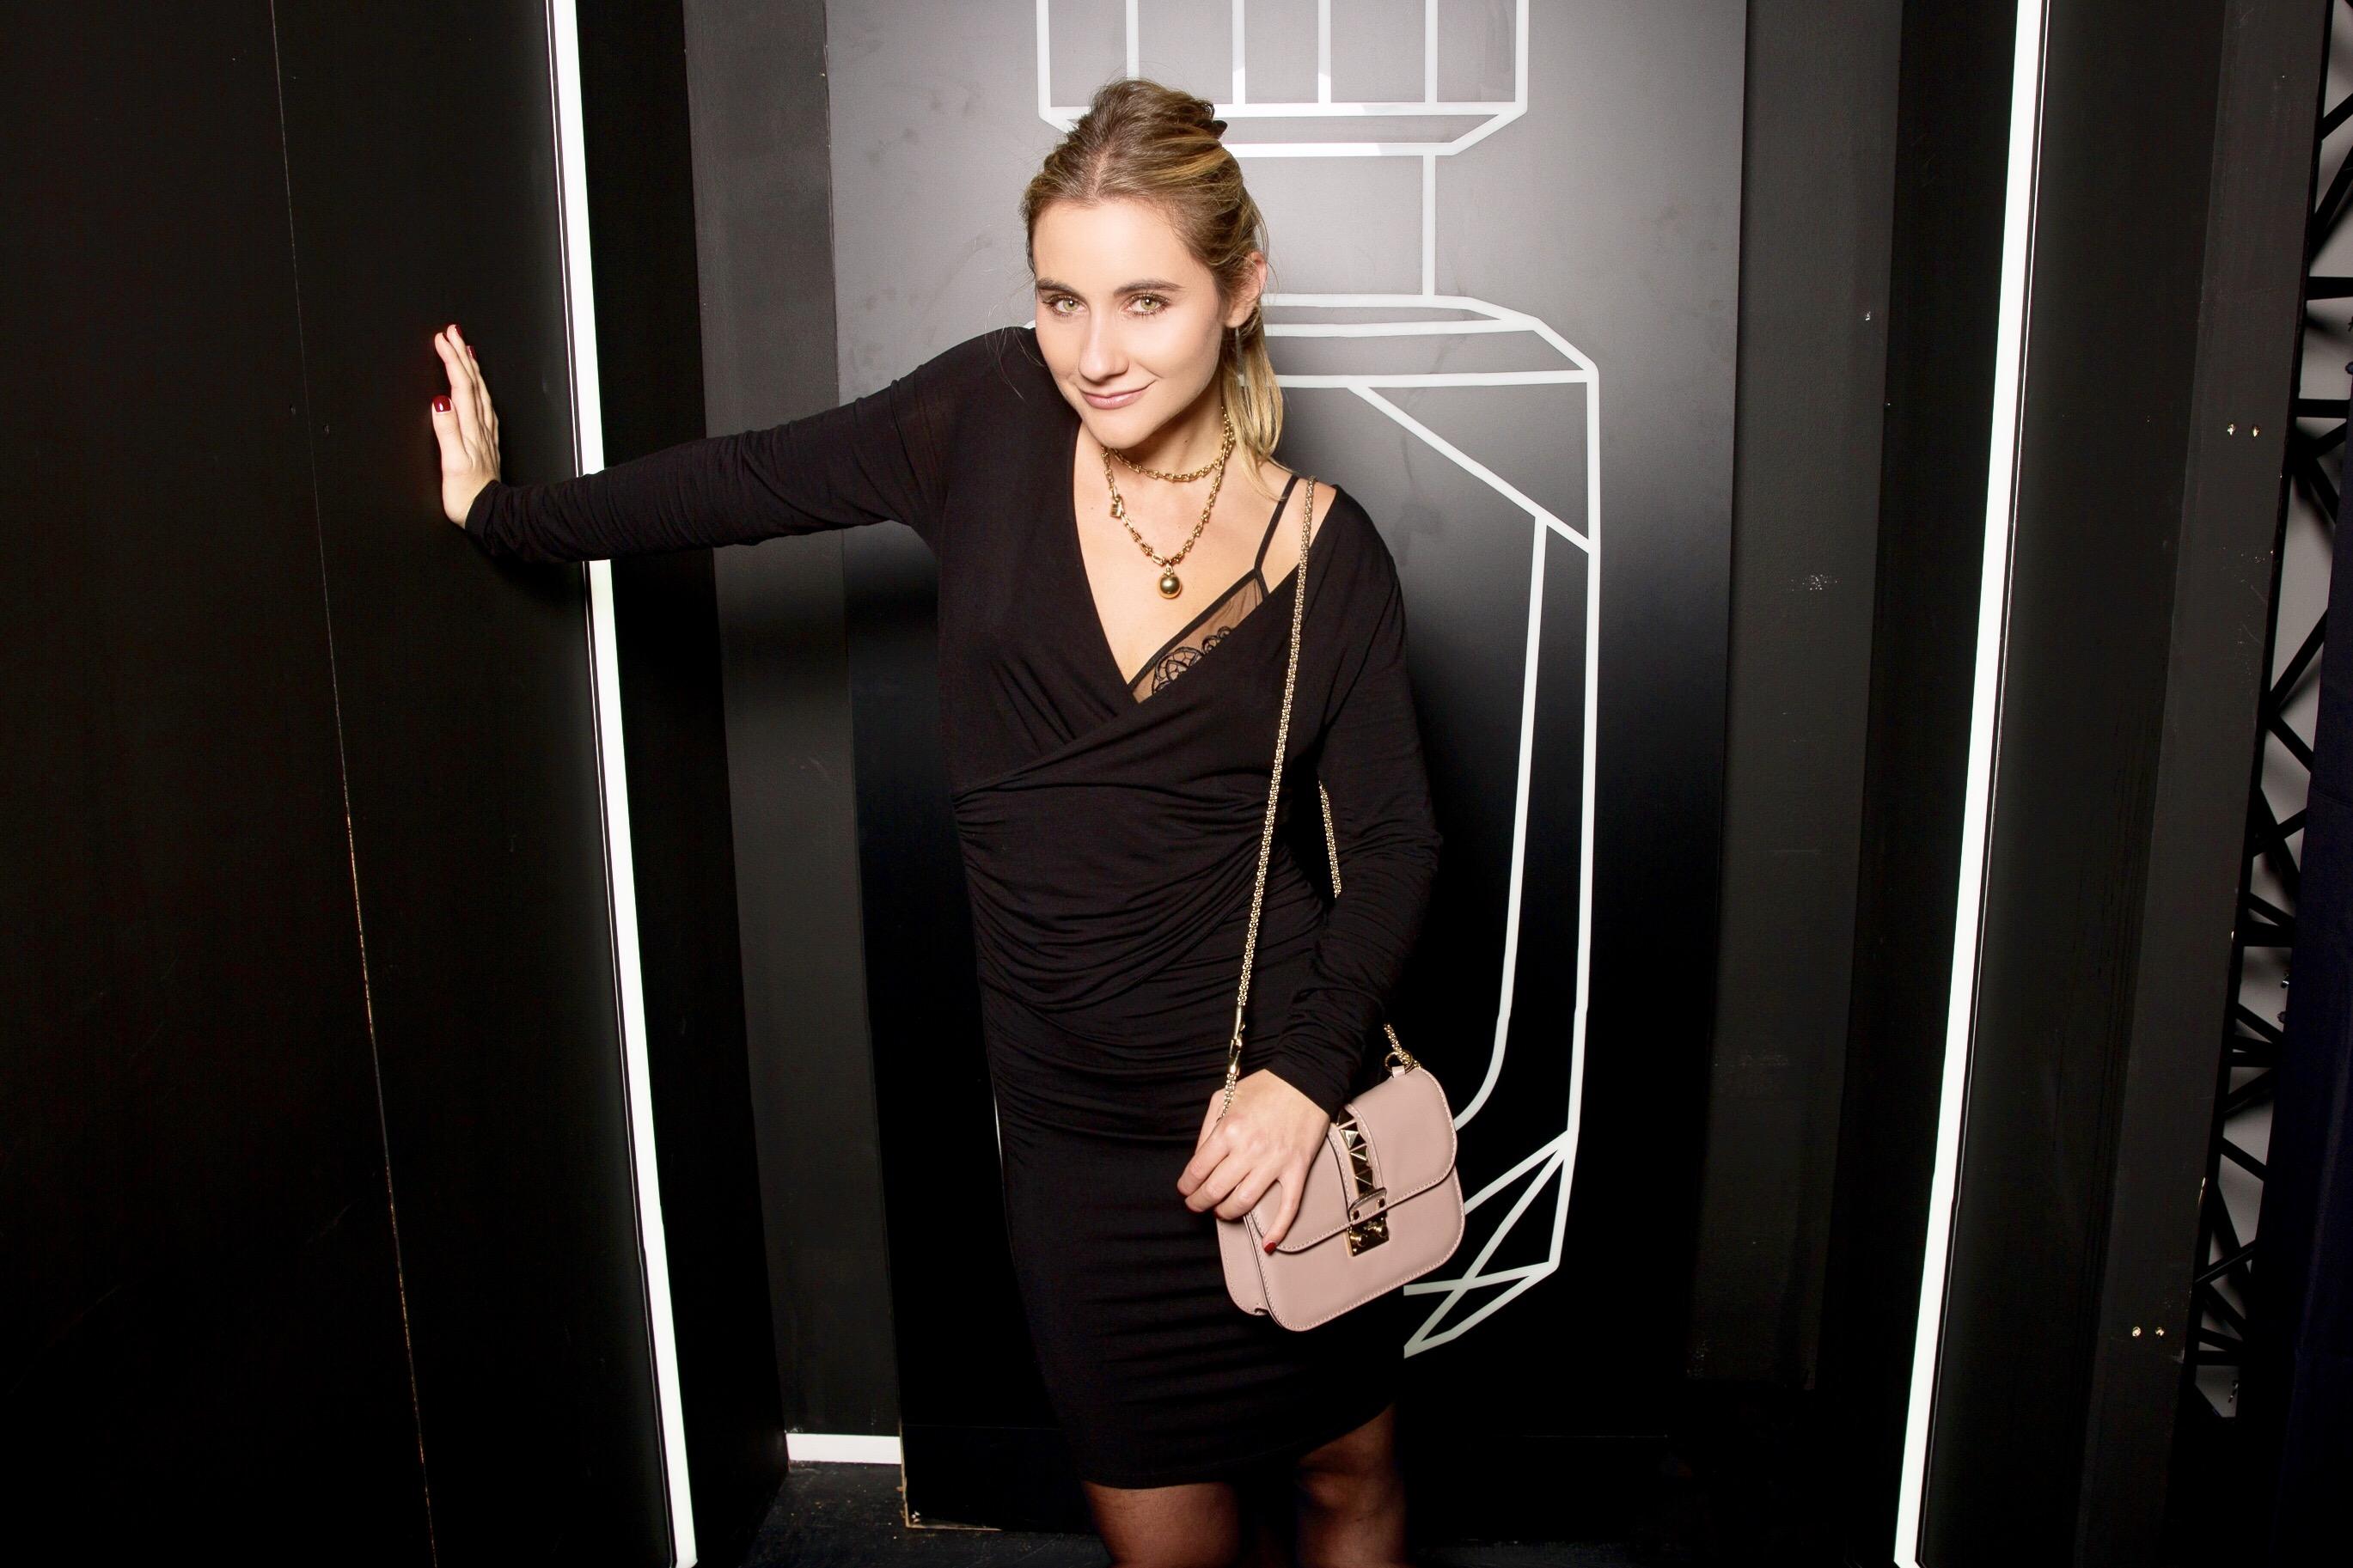 blog mode, camille benaroche, blog beauté, lifestyle, travels, mode, streetstyle, blog mode paris